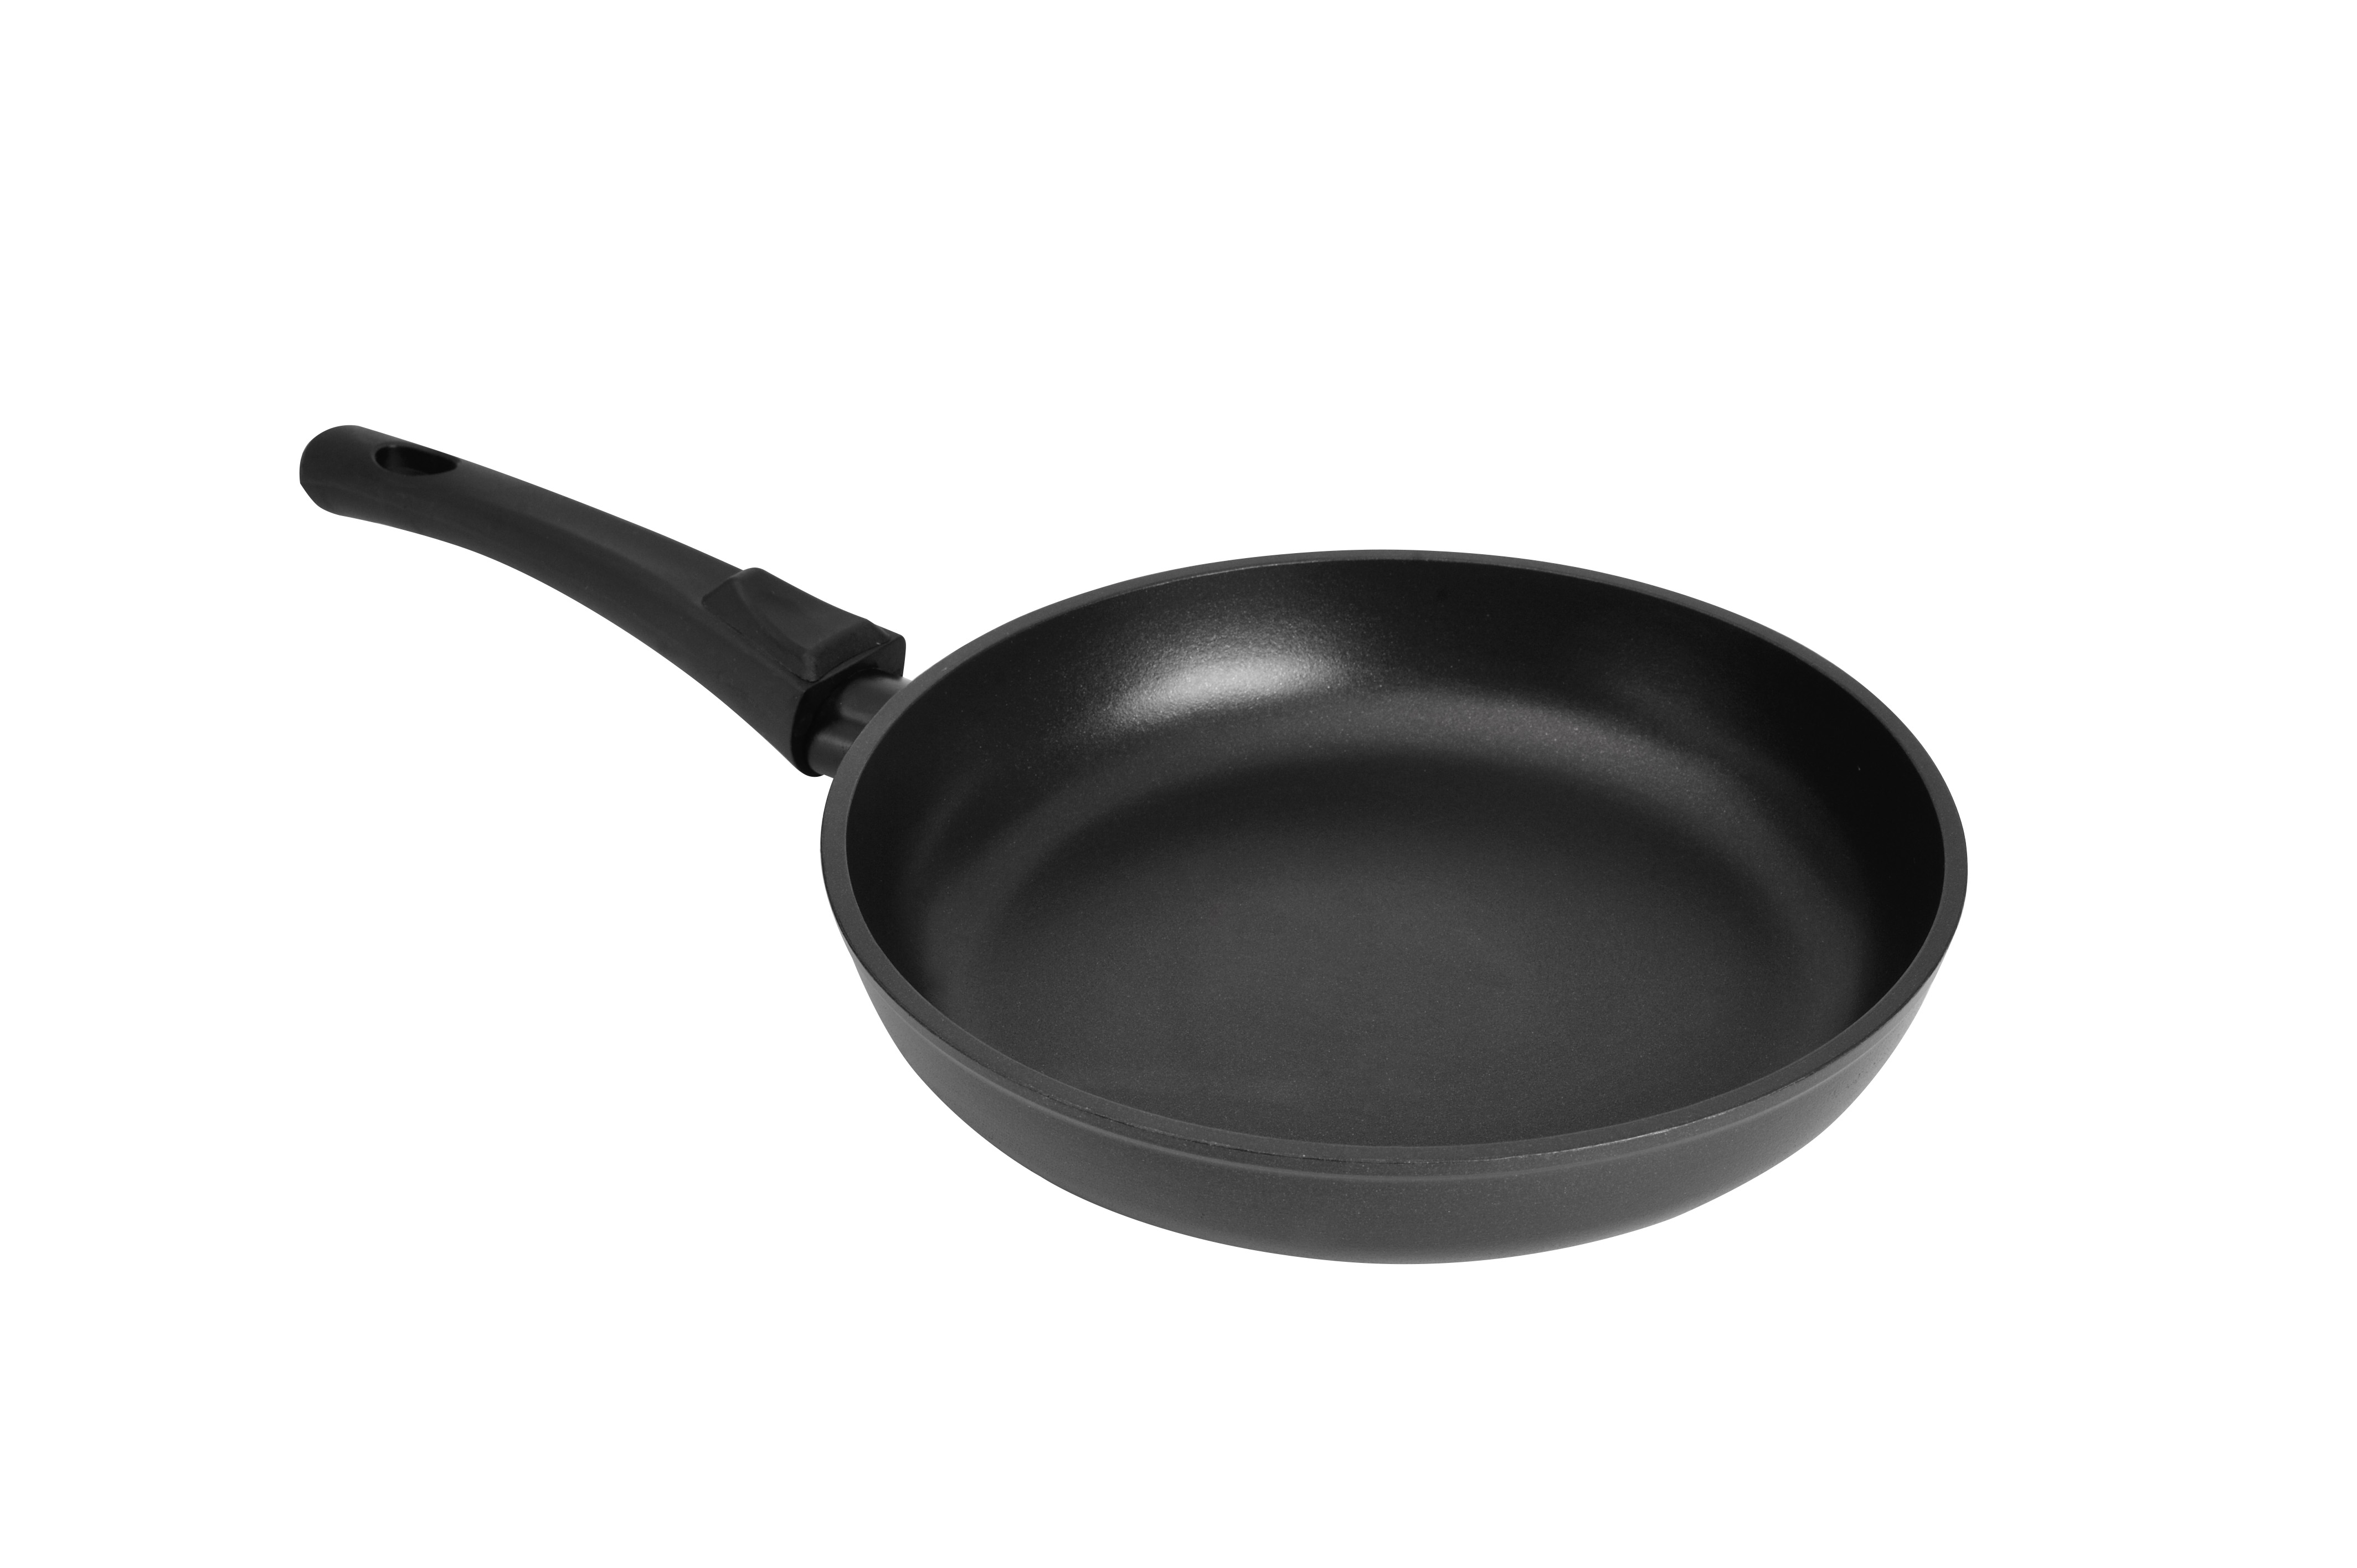 Сковорода Классик низ/борт, съем/руч